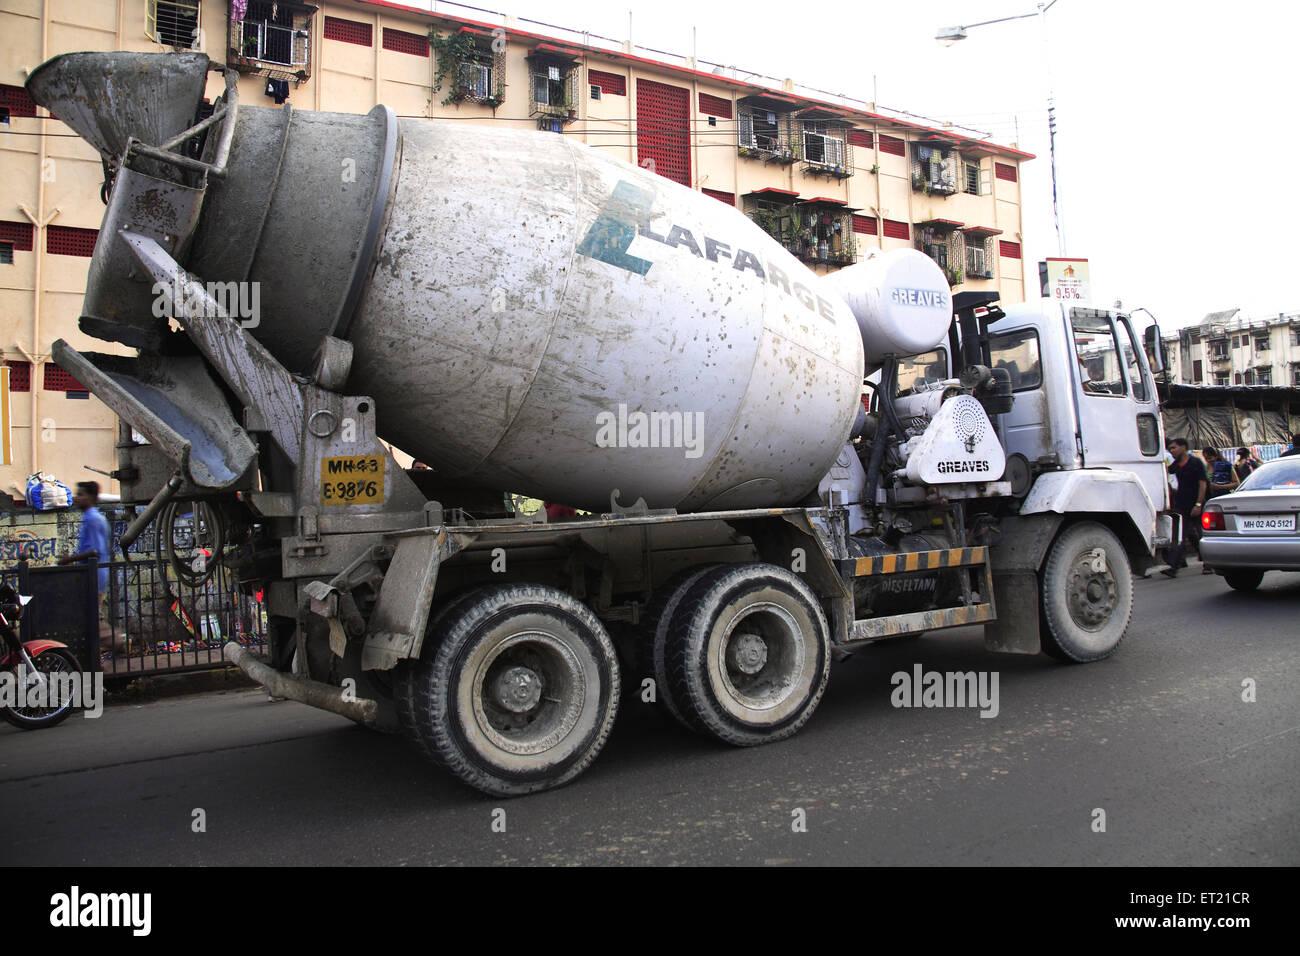 Concrete mixer on road ; Curry Road ; Bombay Mumbai ; Maharashtra ; India 26 August 2009 - Stock Image